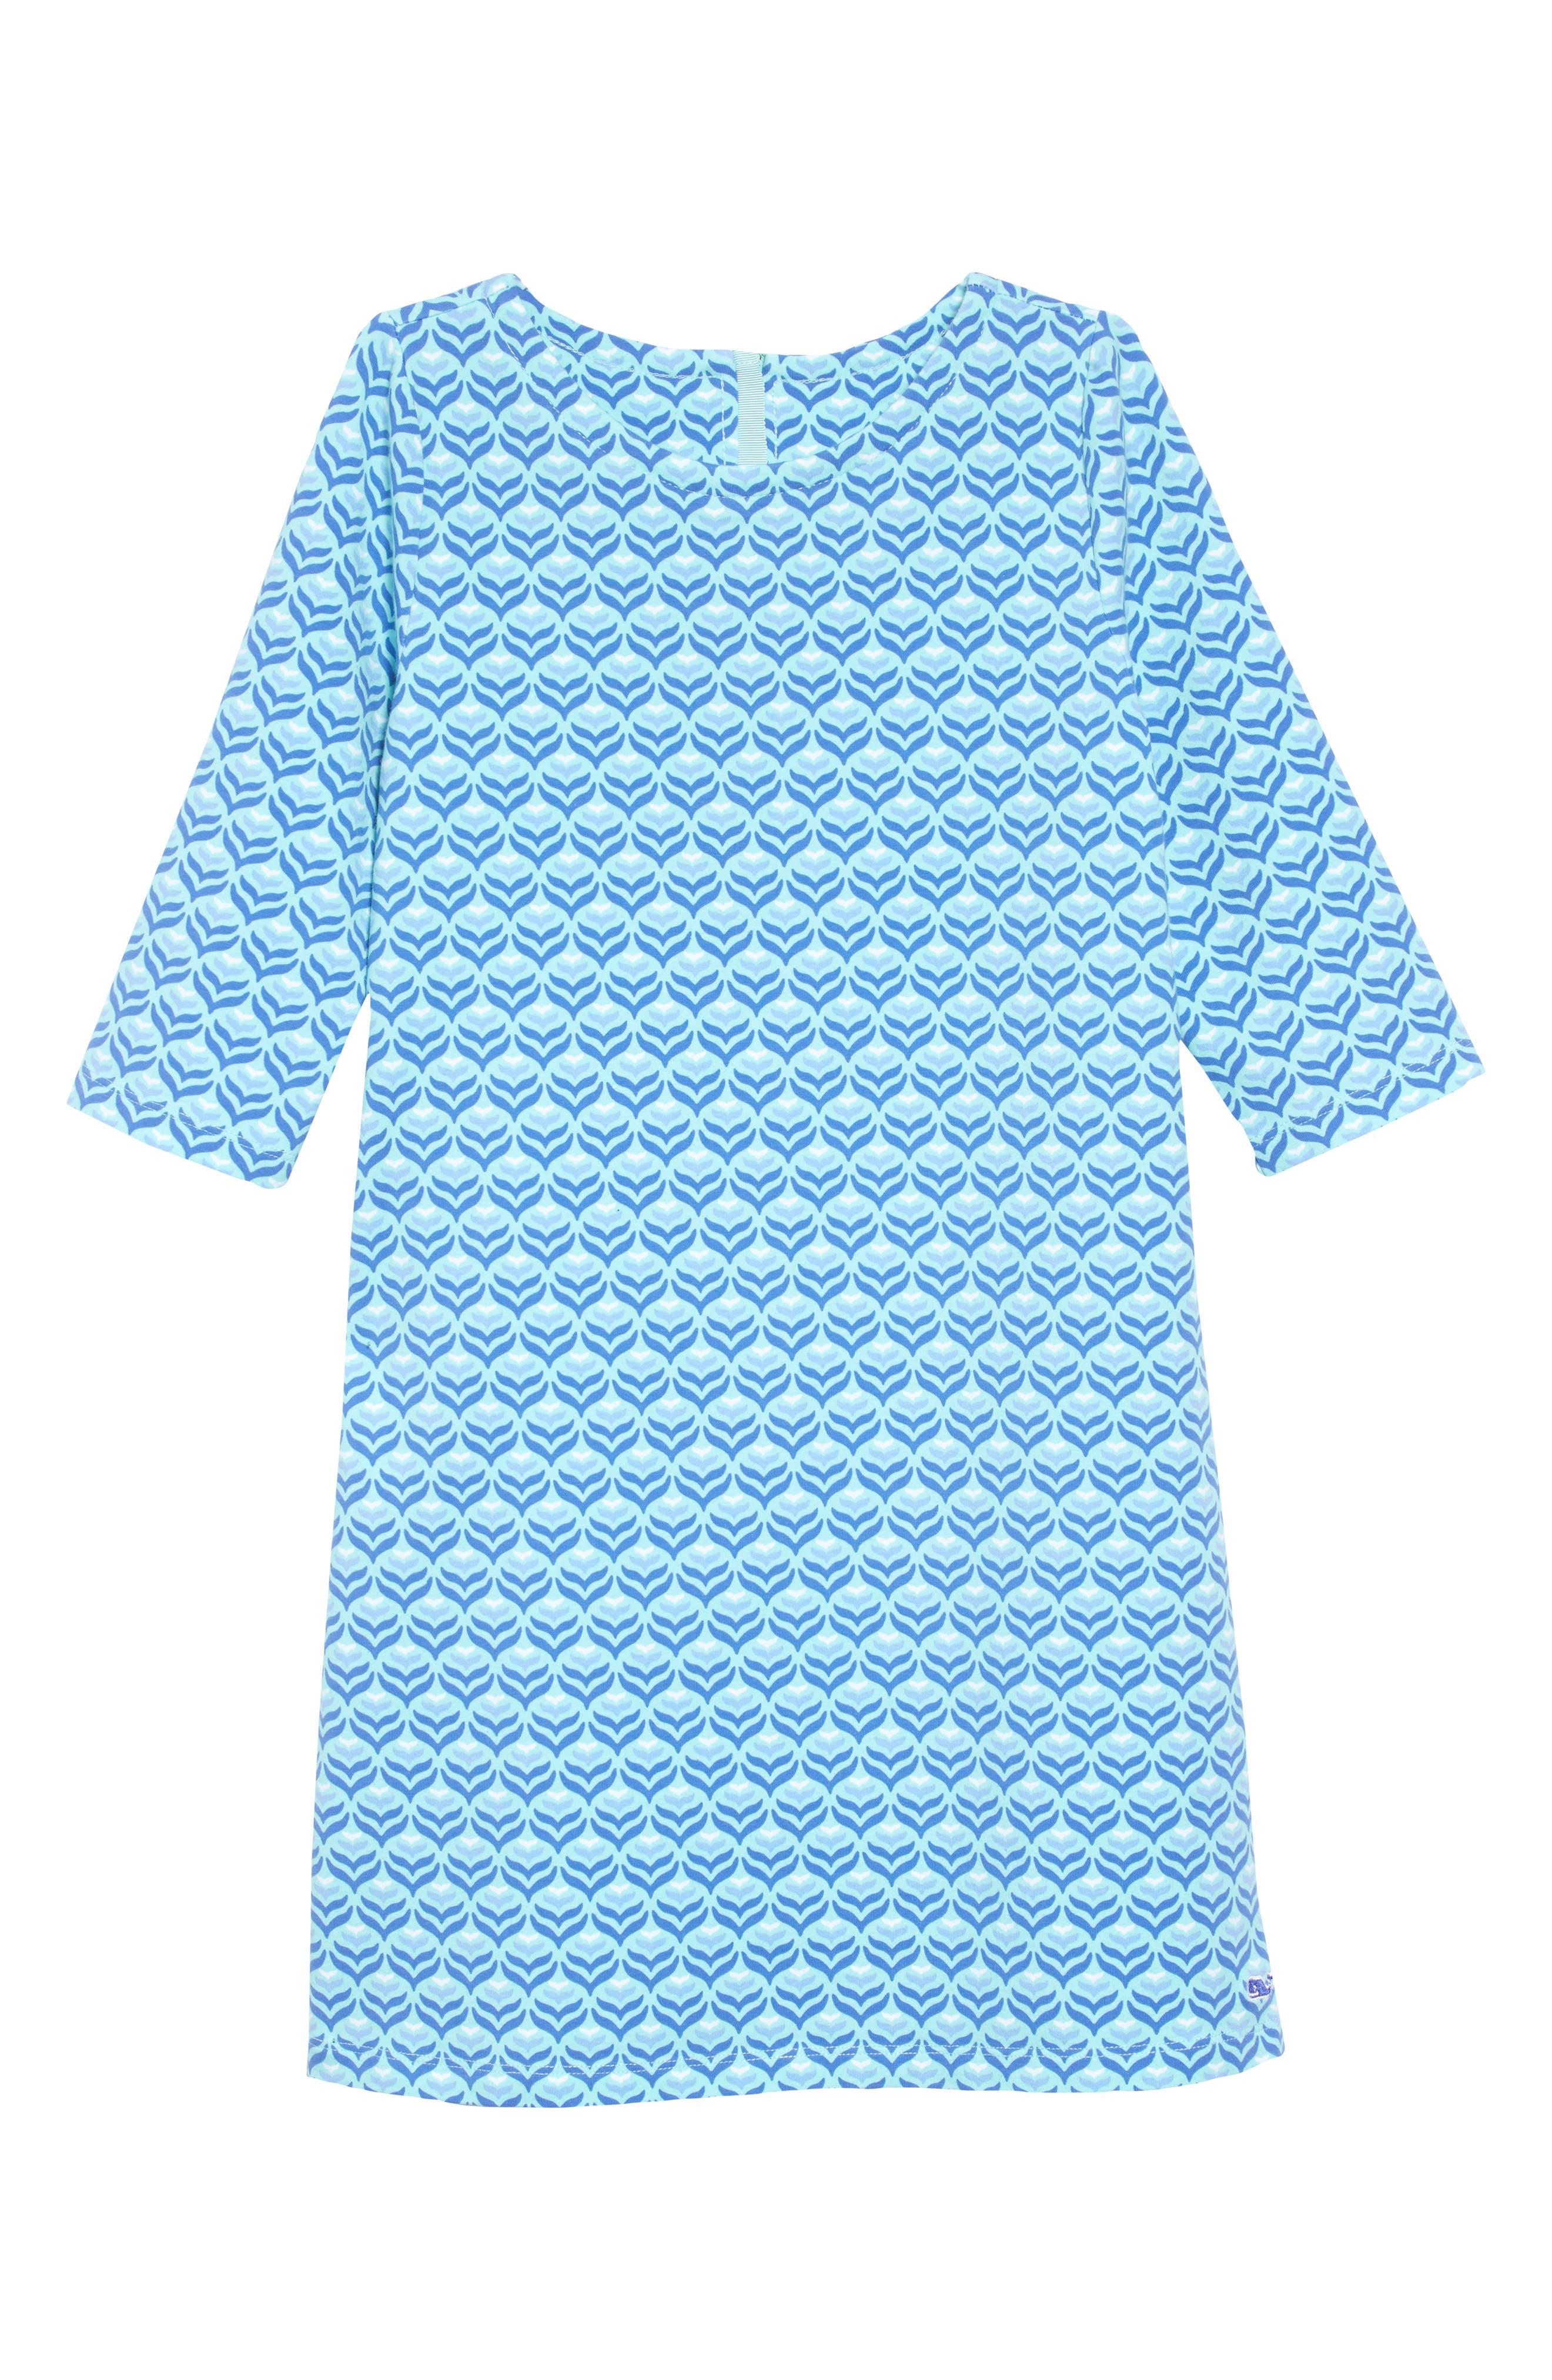 Diamond Whale Tale Shift Dress,                             Main thumbnail 1, color,                             CAICOS